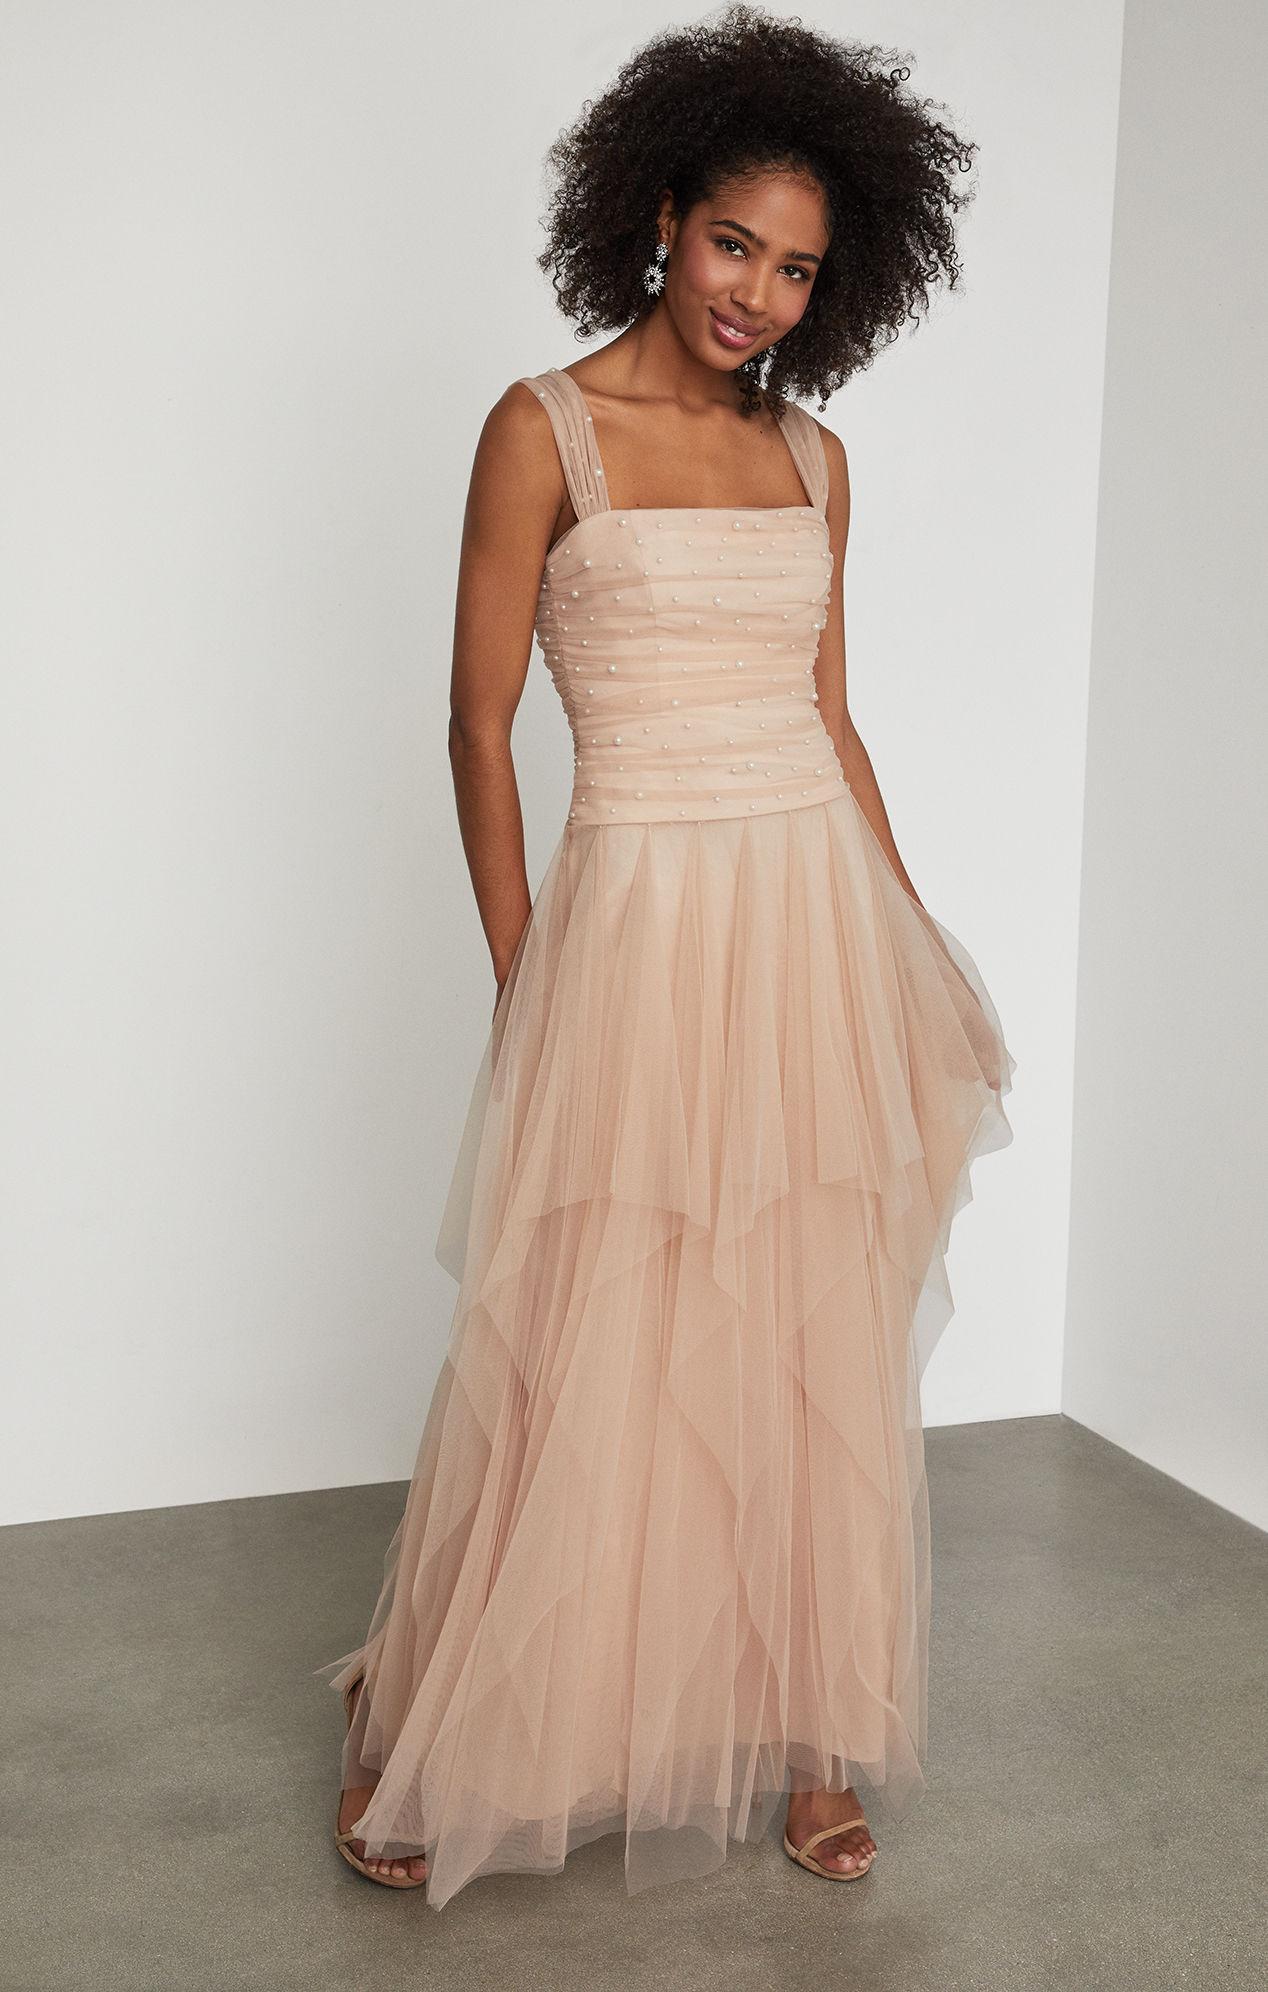 c3c28b10f9cc4 Lyst - BCBGMAXAZRIA Bcbg Faux Pearl Ruffle Gown